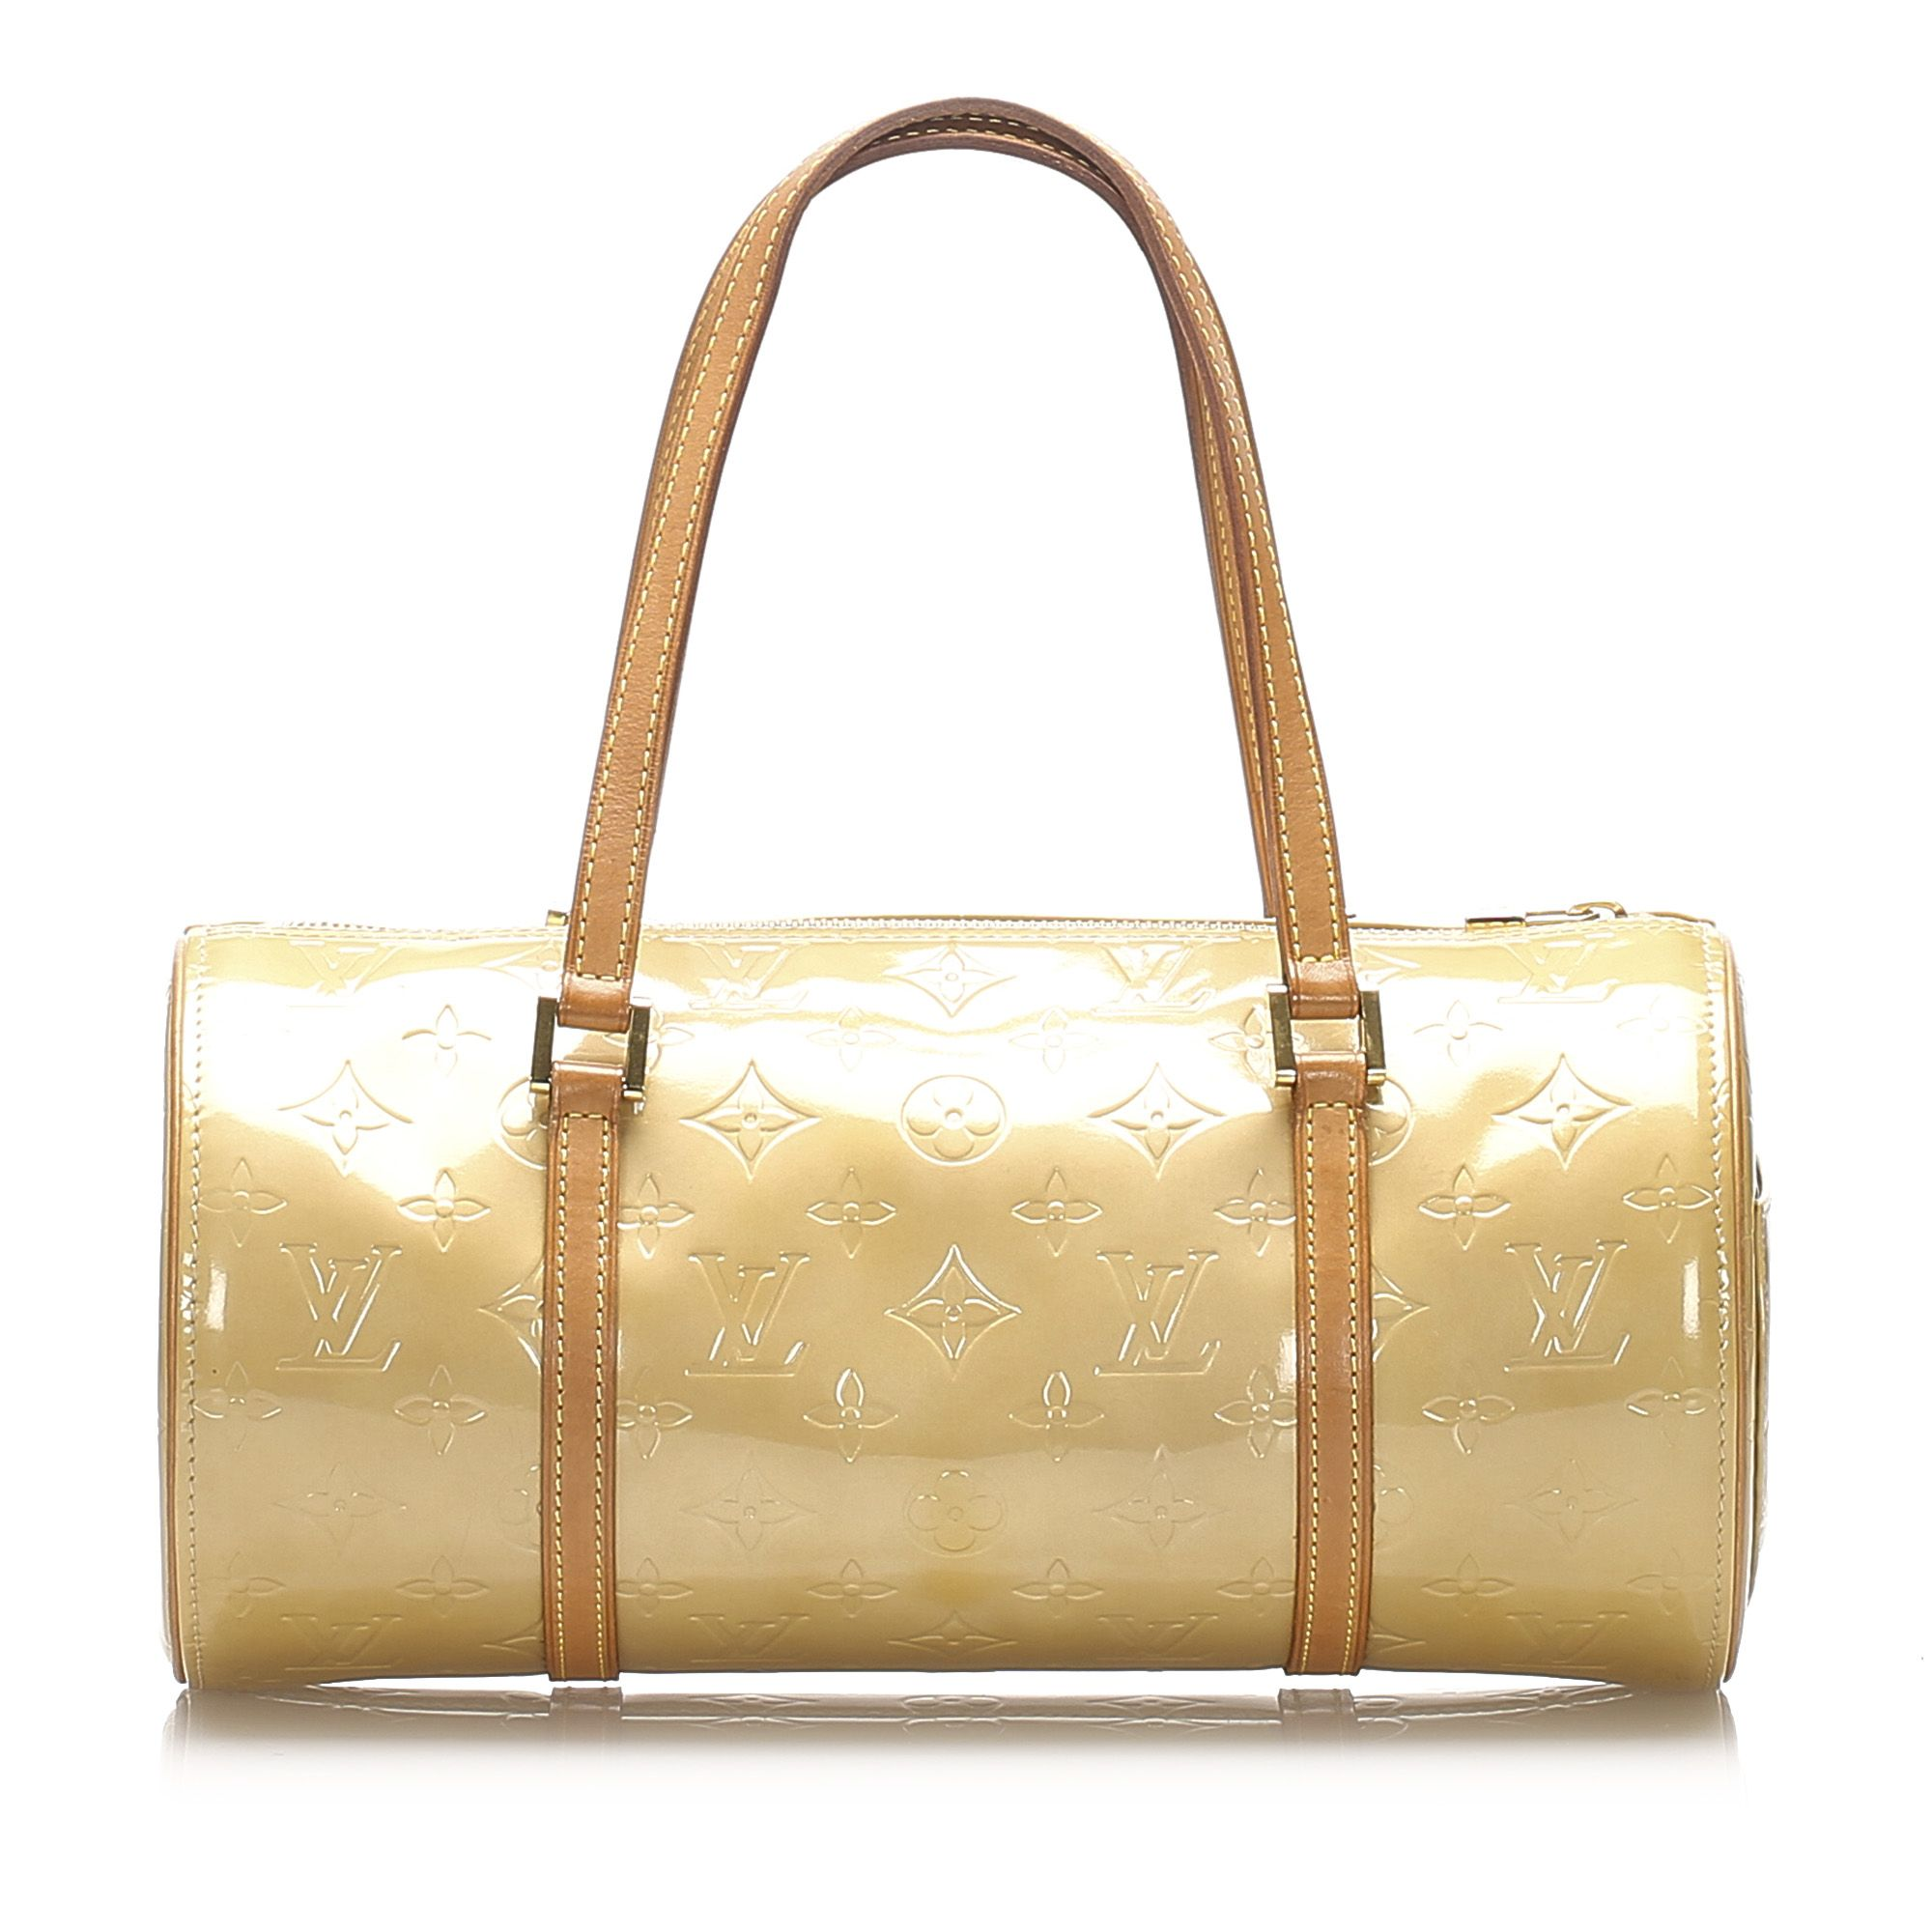 Vintage Louis Vuitton Vernis Bedford Brown